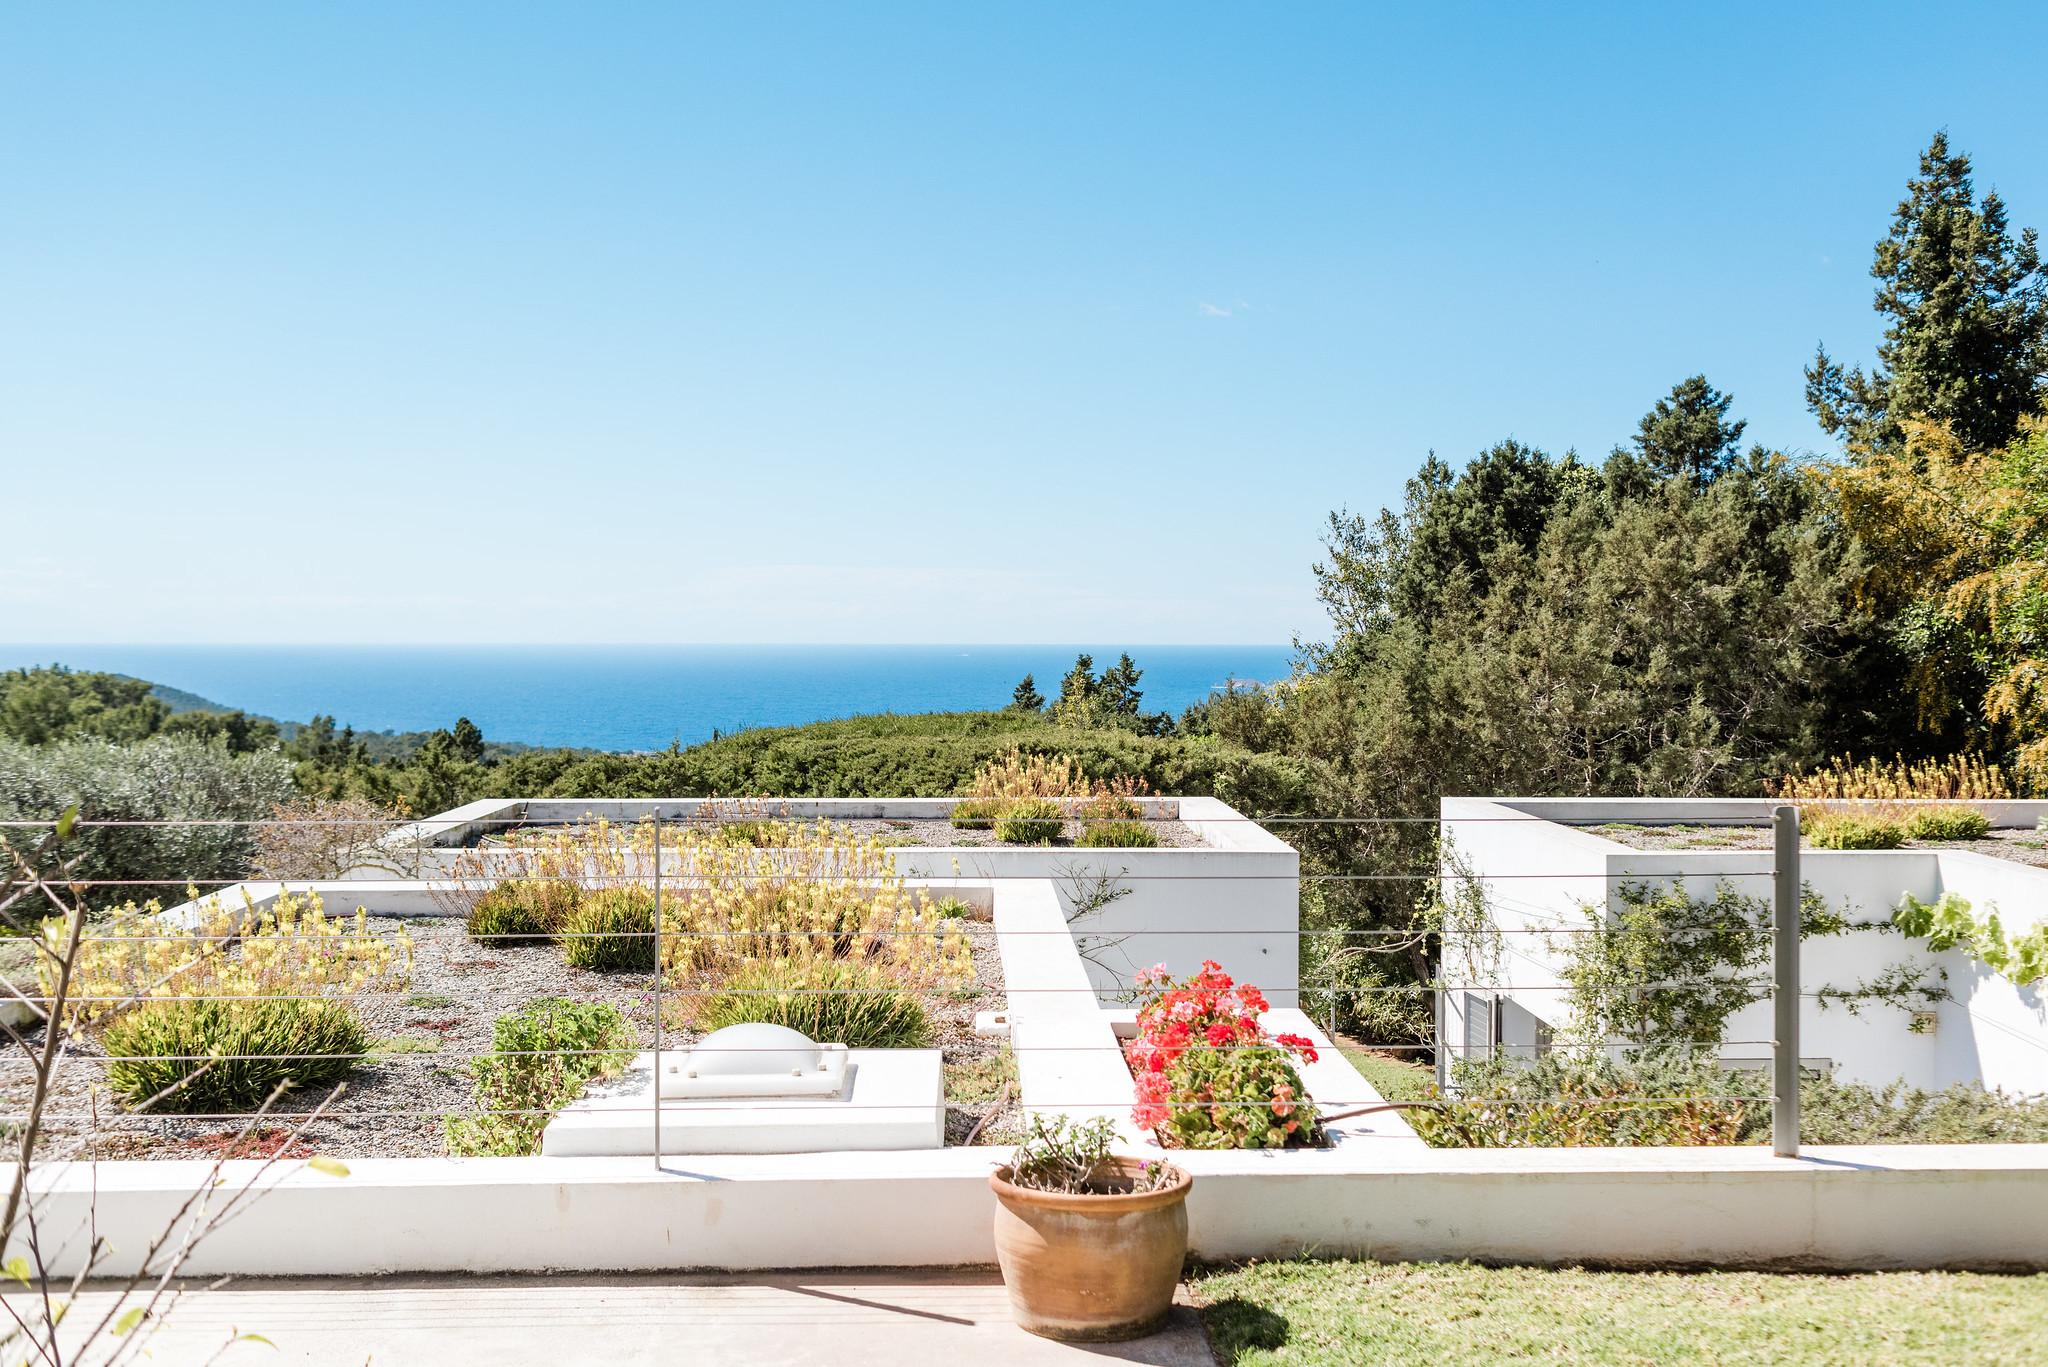 https://www.white-ibiza.com/wp-content/uploads/2020/06/white-ibiza-villas-casa-nyah-exterior-view.jpg